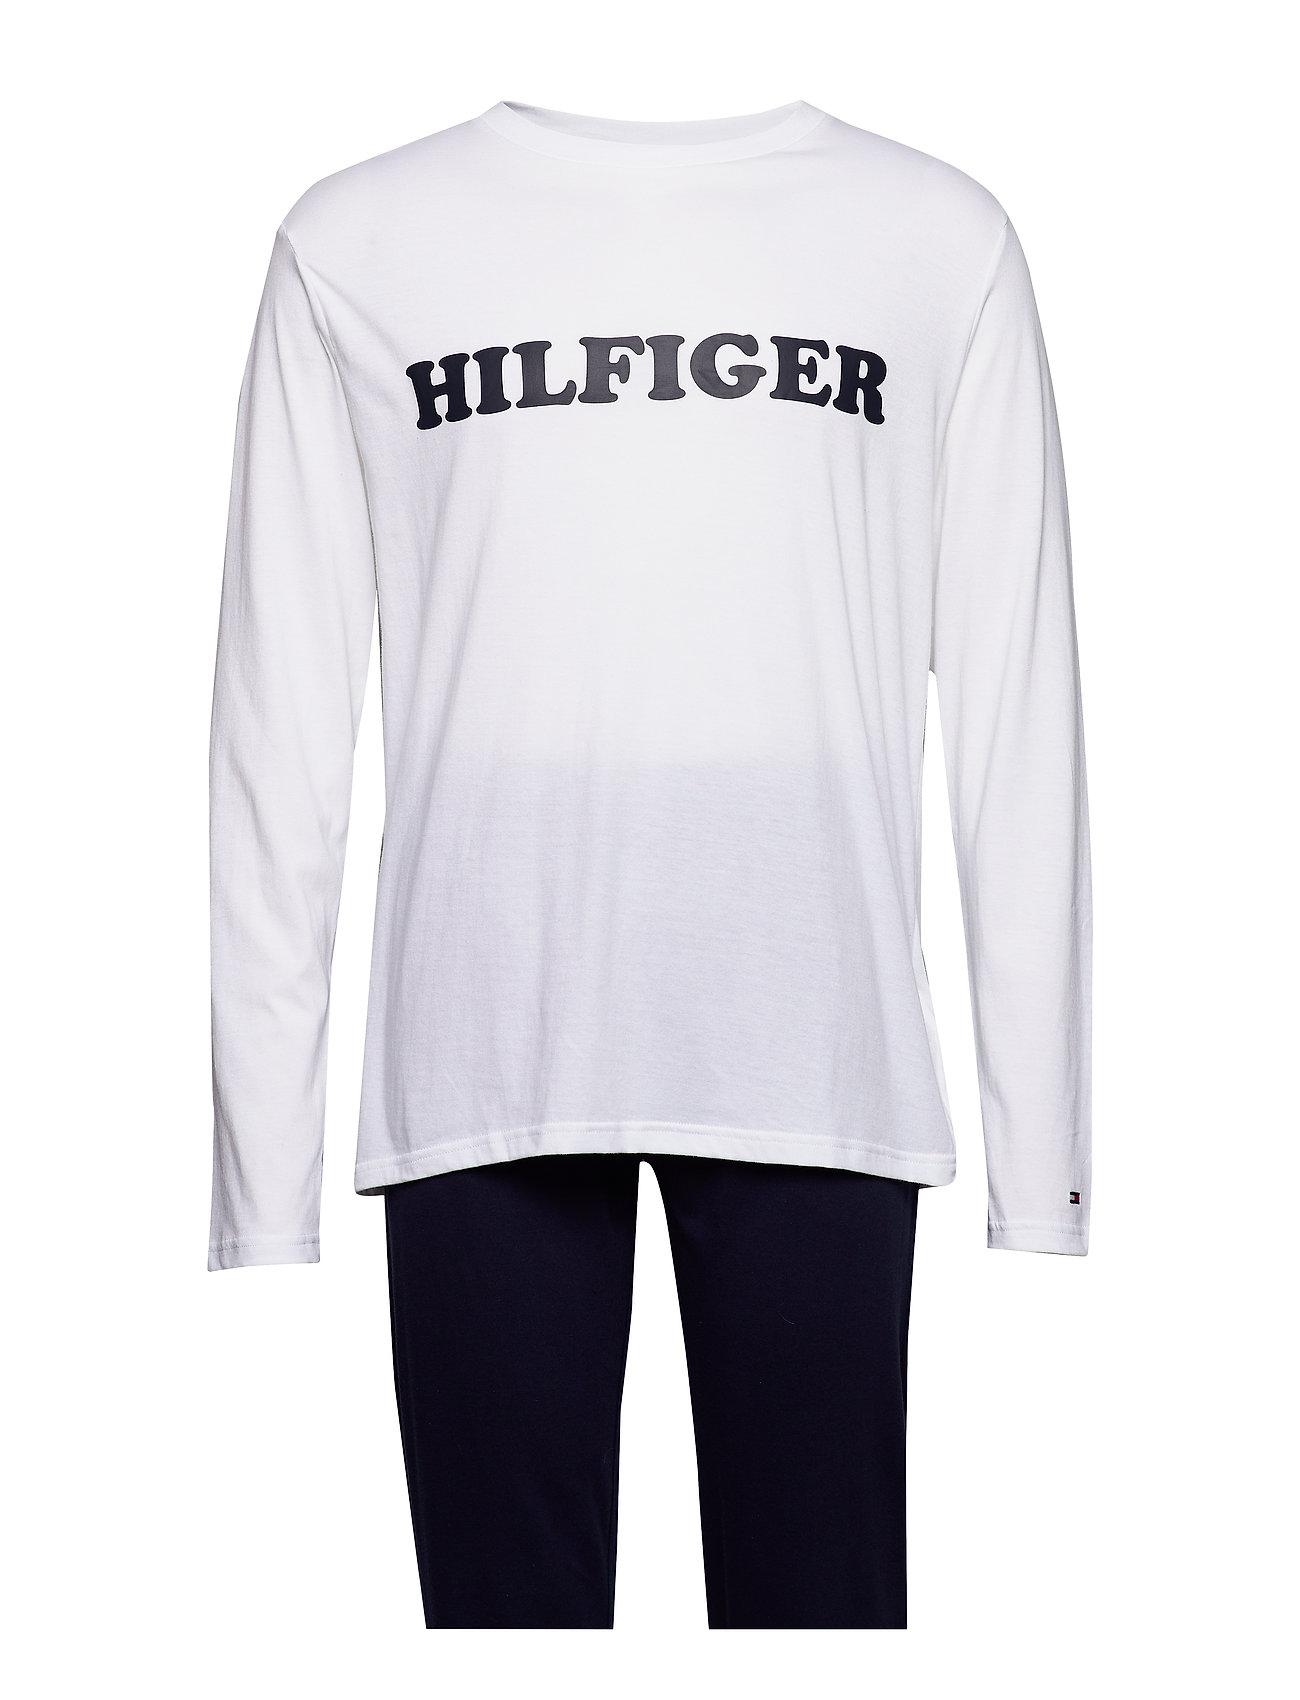 Tommy Hilfiger CN LS PANT JERSEY LO - WHITE/NAVY BLAZER